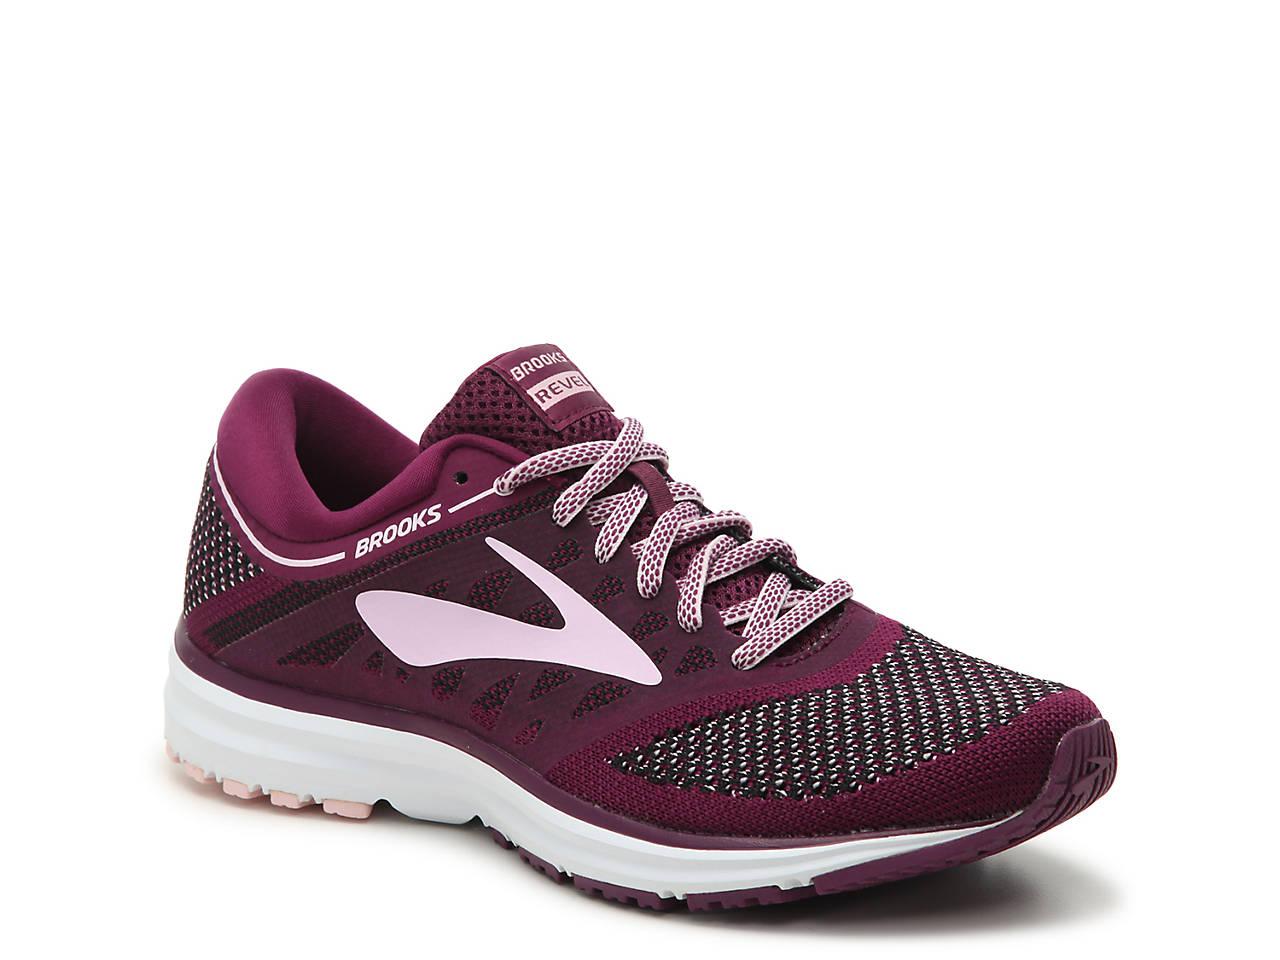 Brooks Revel Performance Running Shoe - Women s Women s Shoes  d8284f3b86